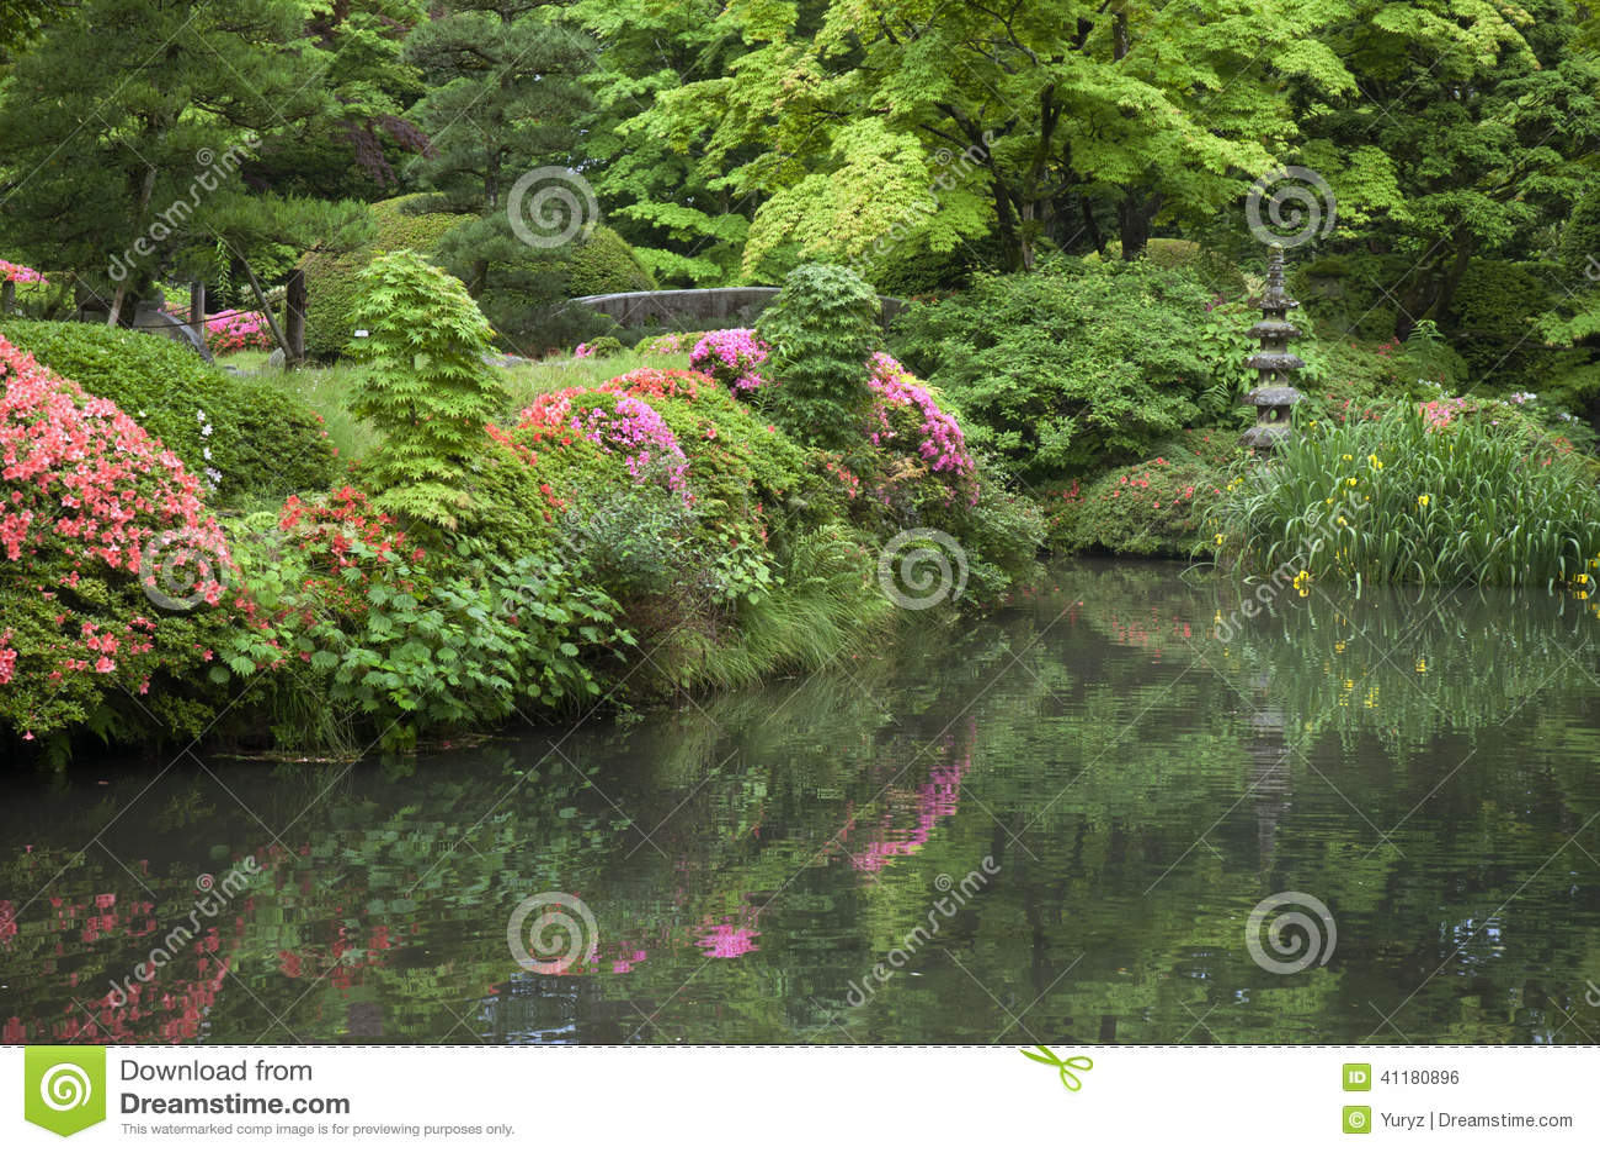 zen garden summer - photo #5